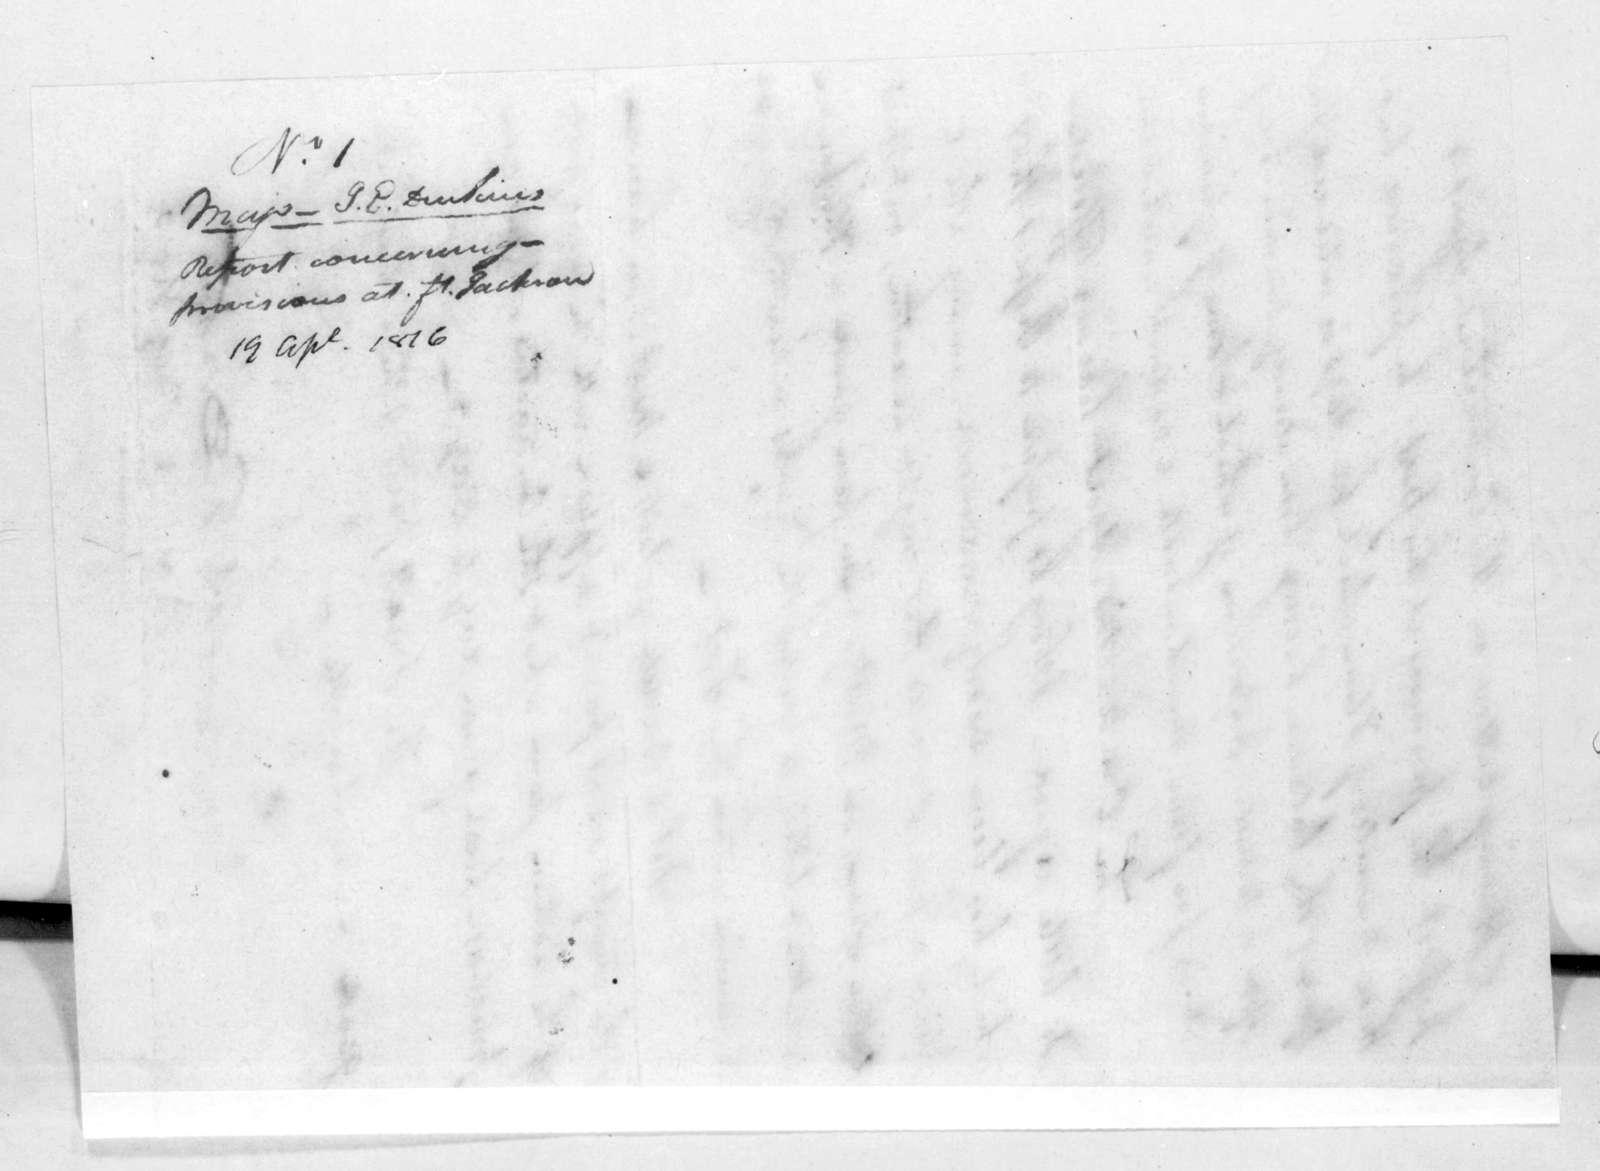 James Edward Dinkins to Andrew Jackson, April 19, 1816